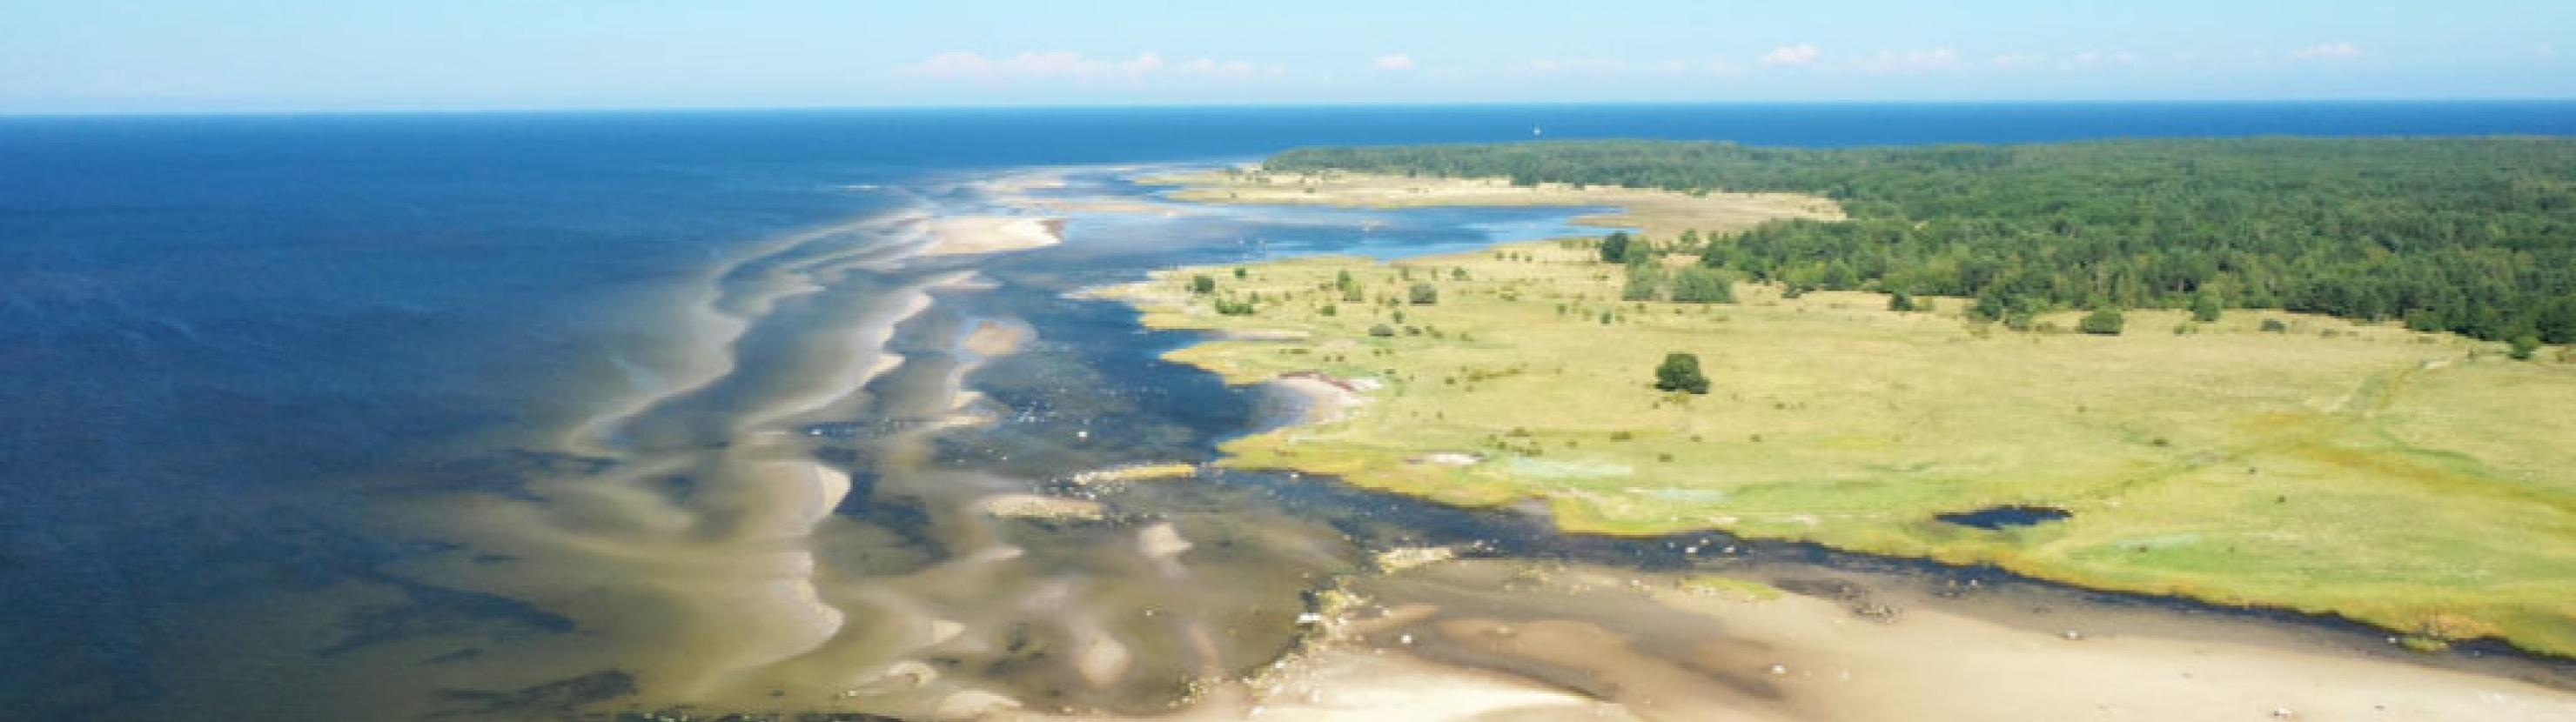 Ruhnu - saar eestlaste maailma servas